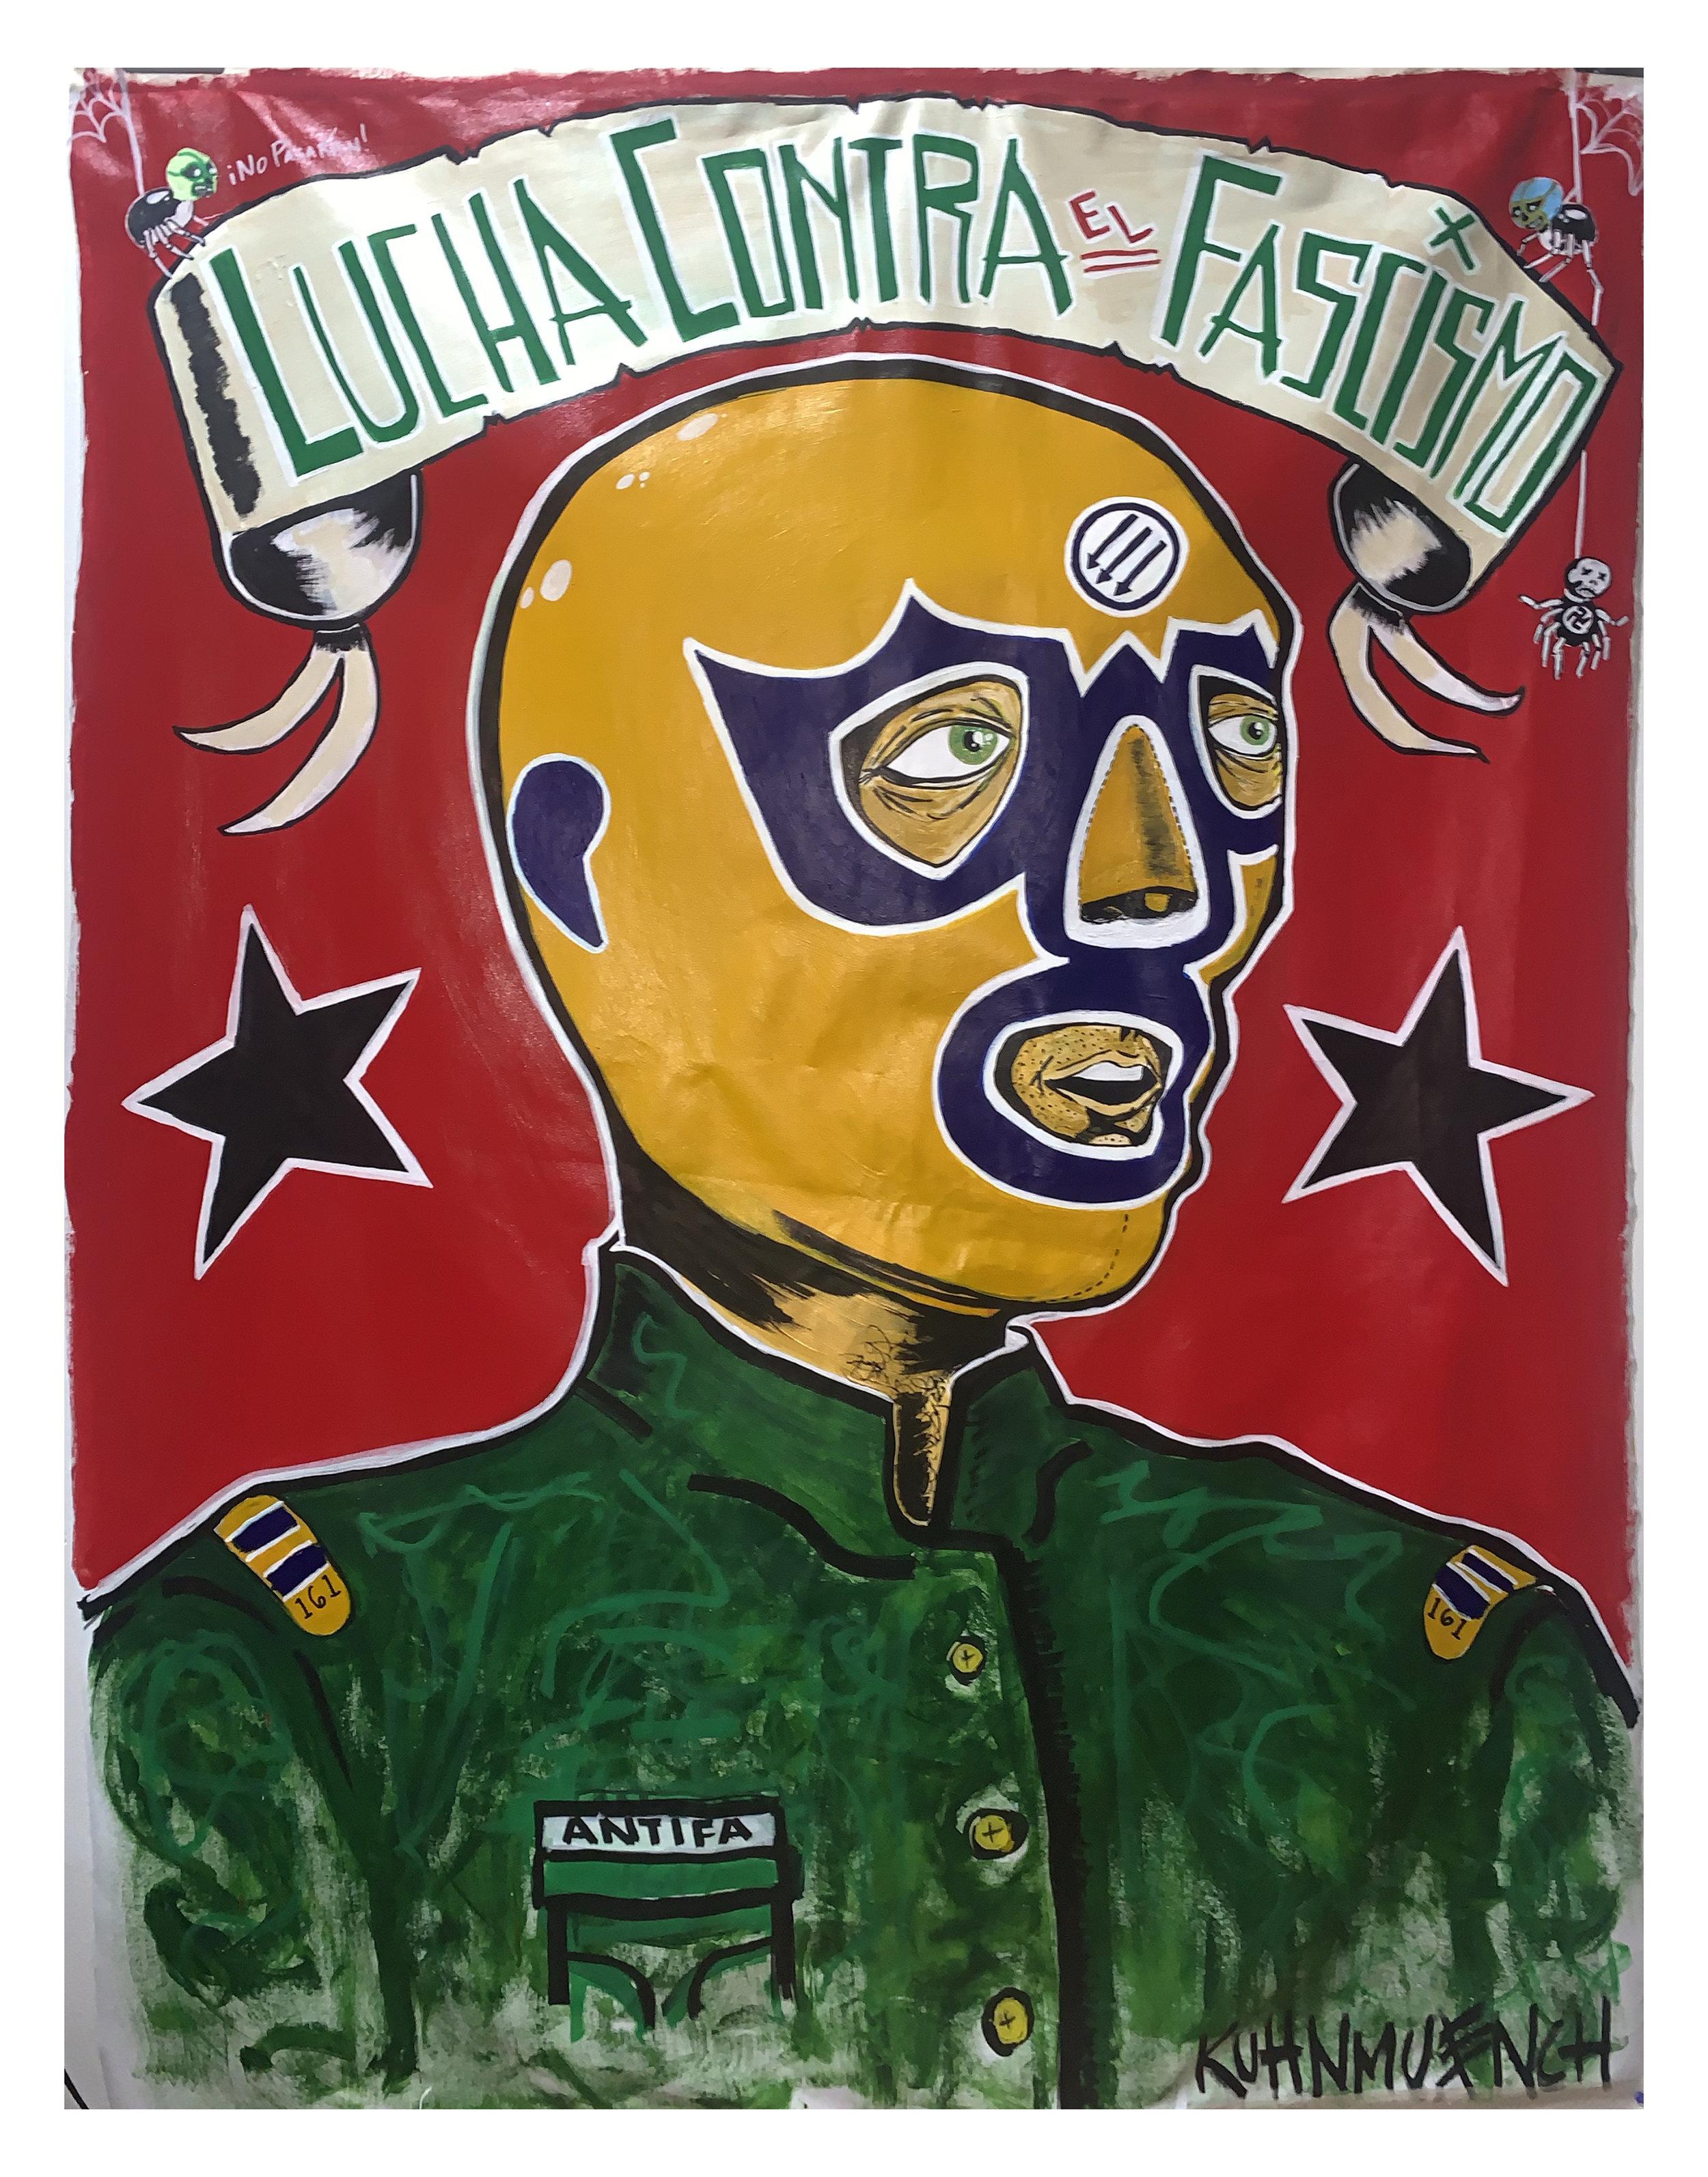 Lucha Contra el Fascismo